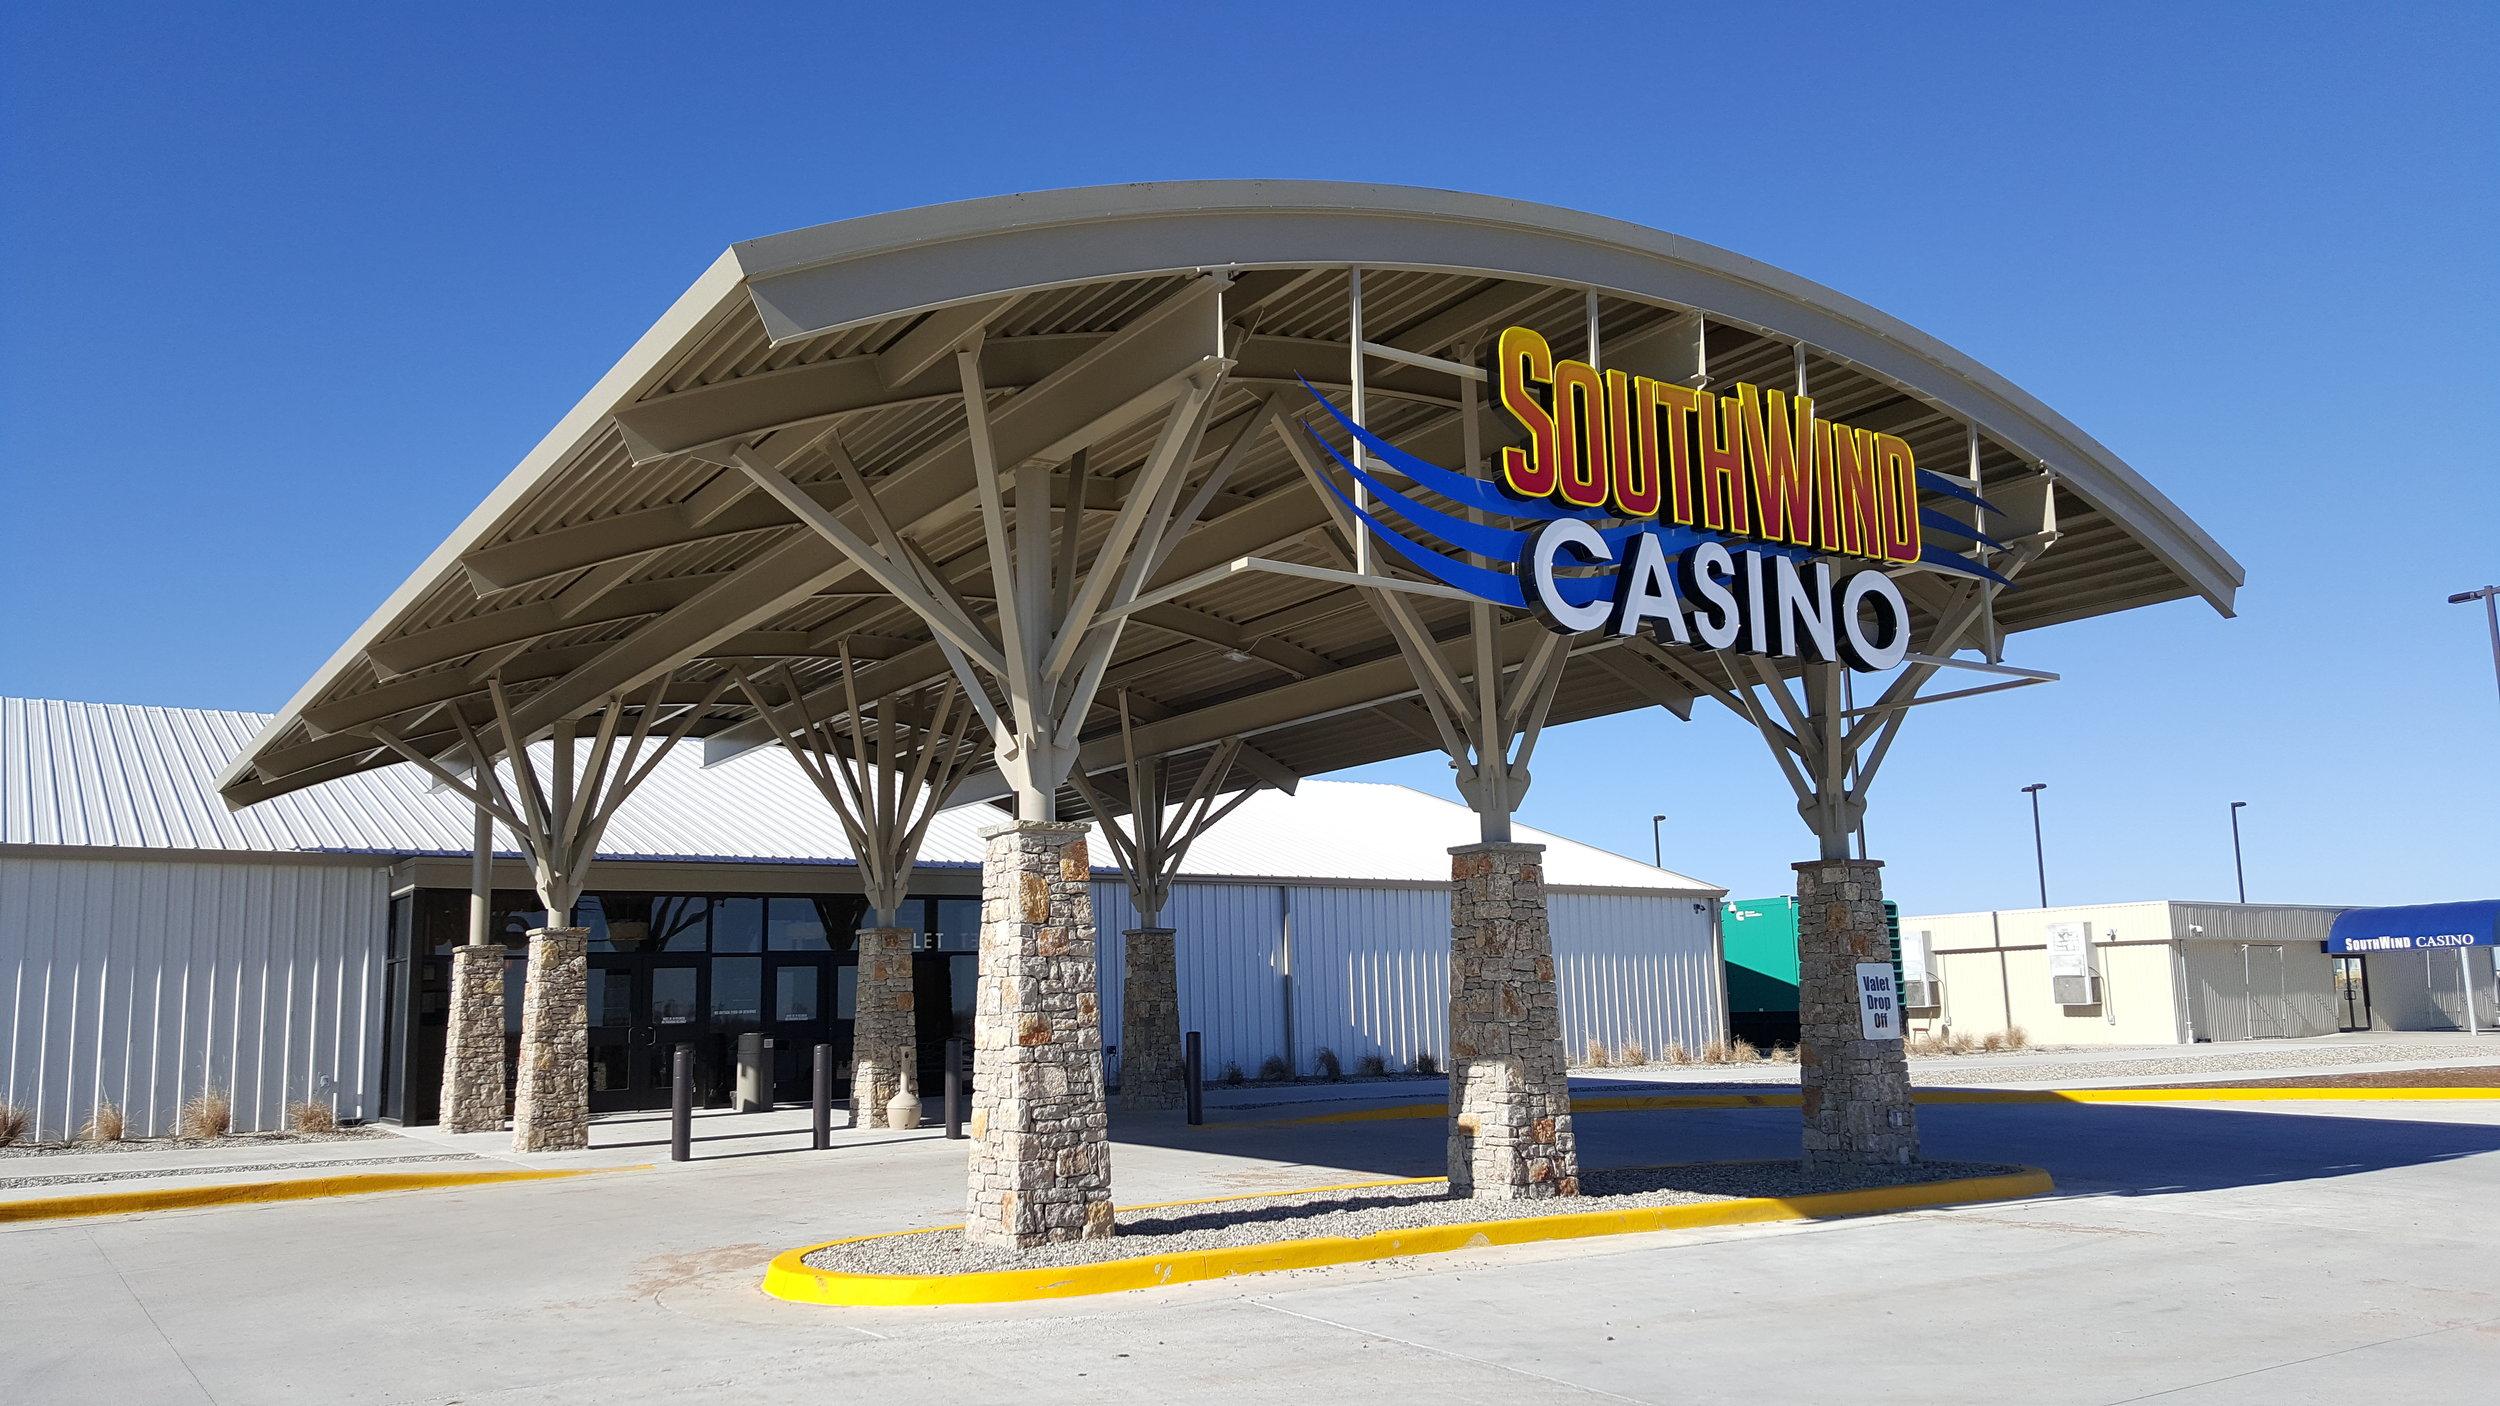 Kaw Casino6.jpg